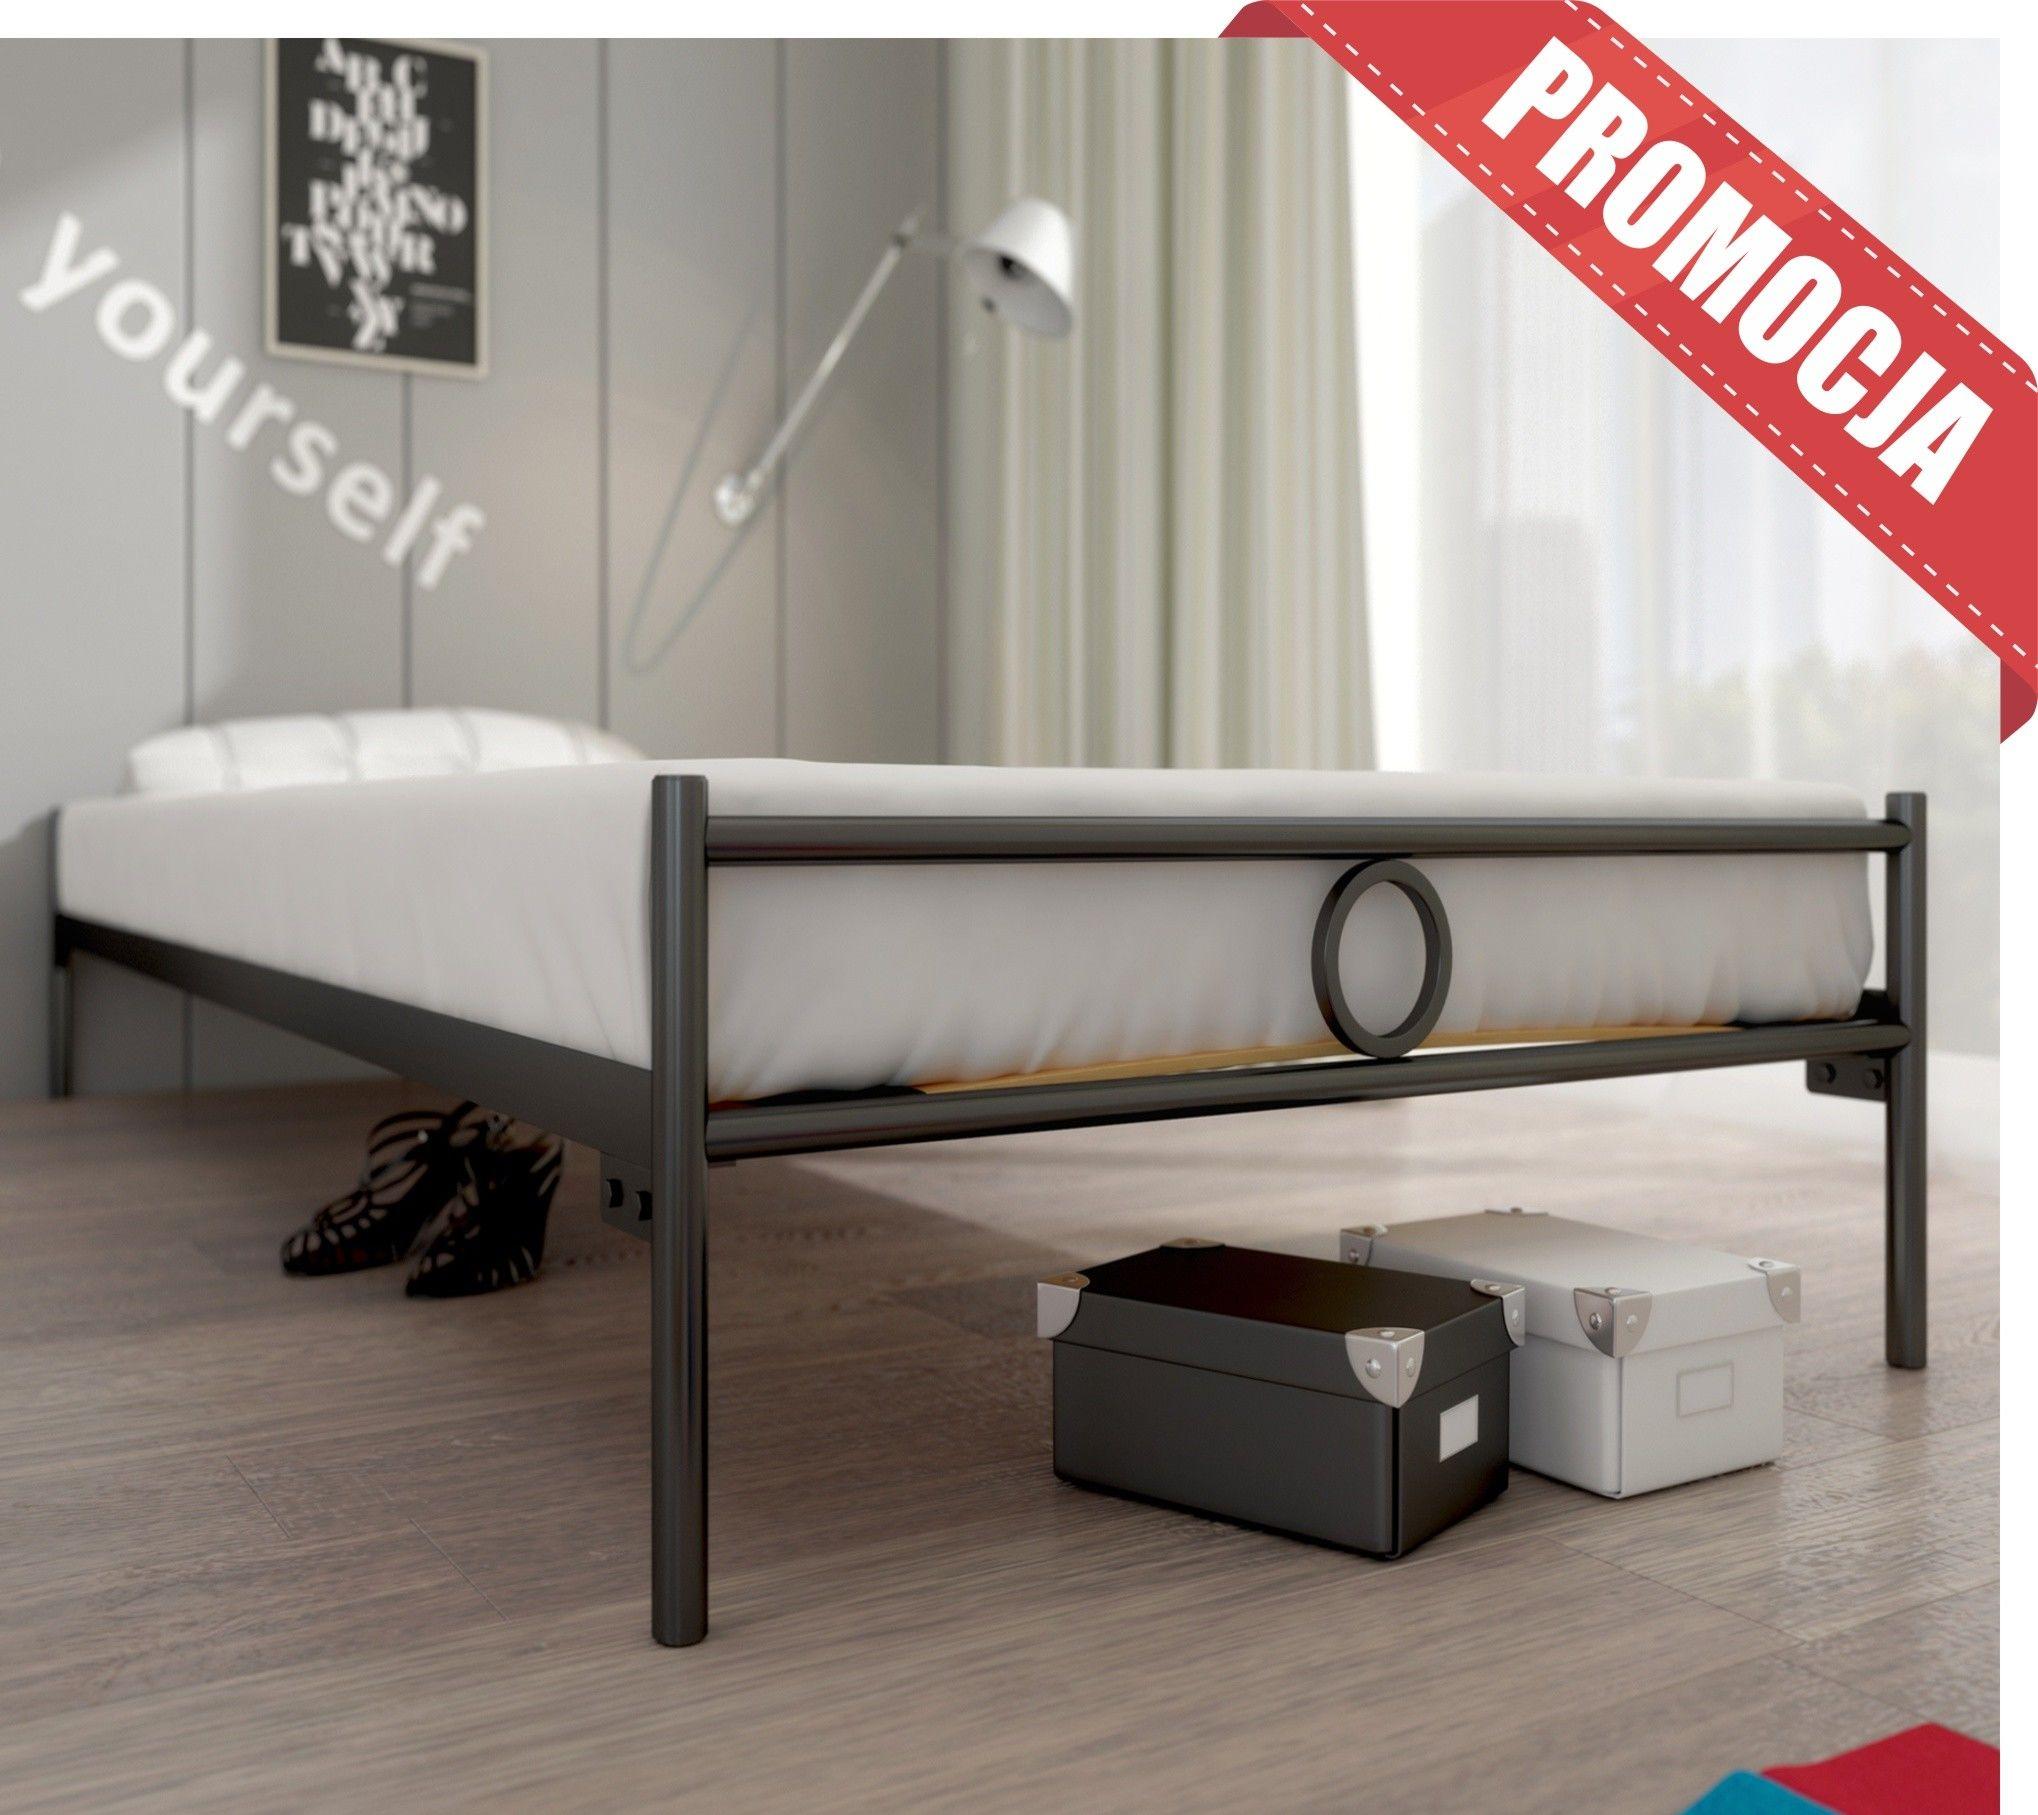 łóżko Lak System Basic 100 x 200 ze stelażem